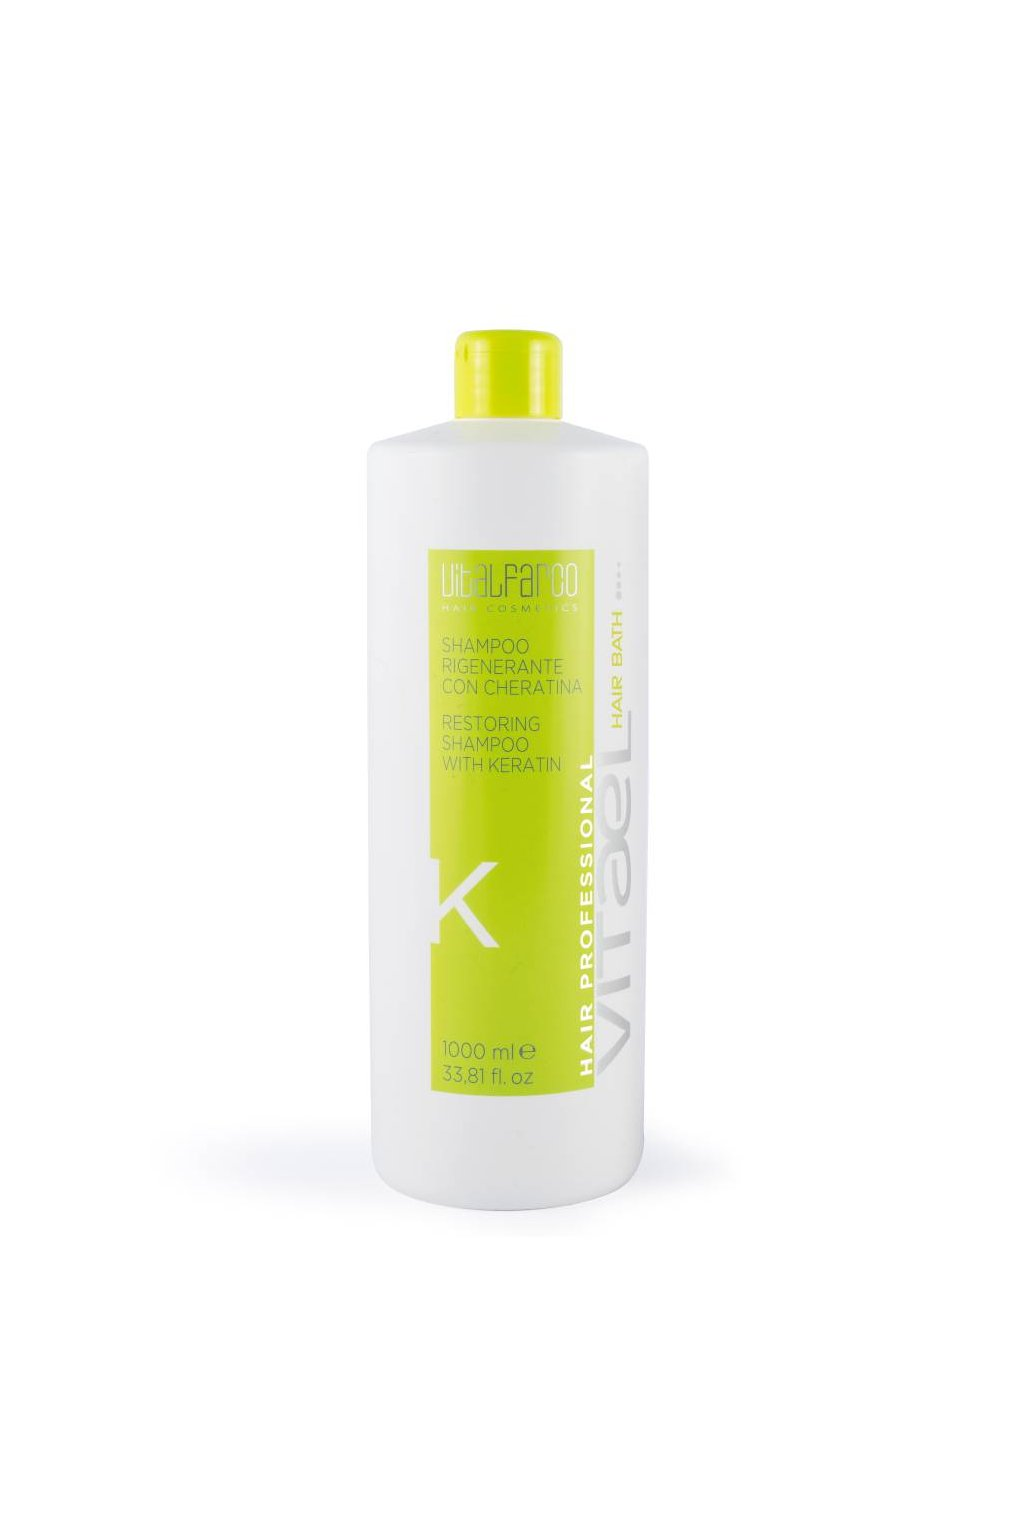 10976 vitael keratin sampon k regeneracni pro suche barvene a poskozene vlasy 1000ml